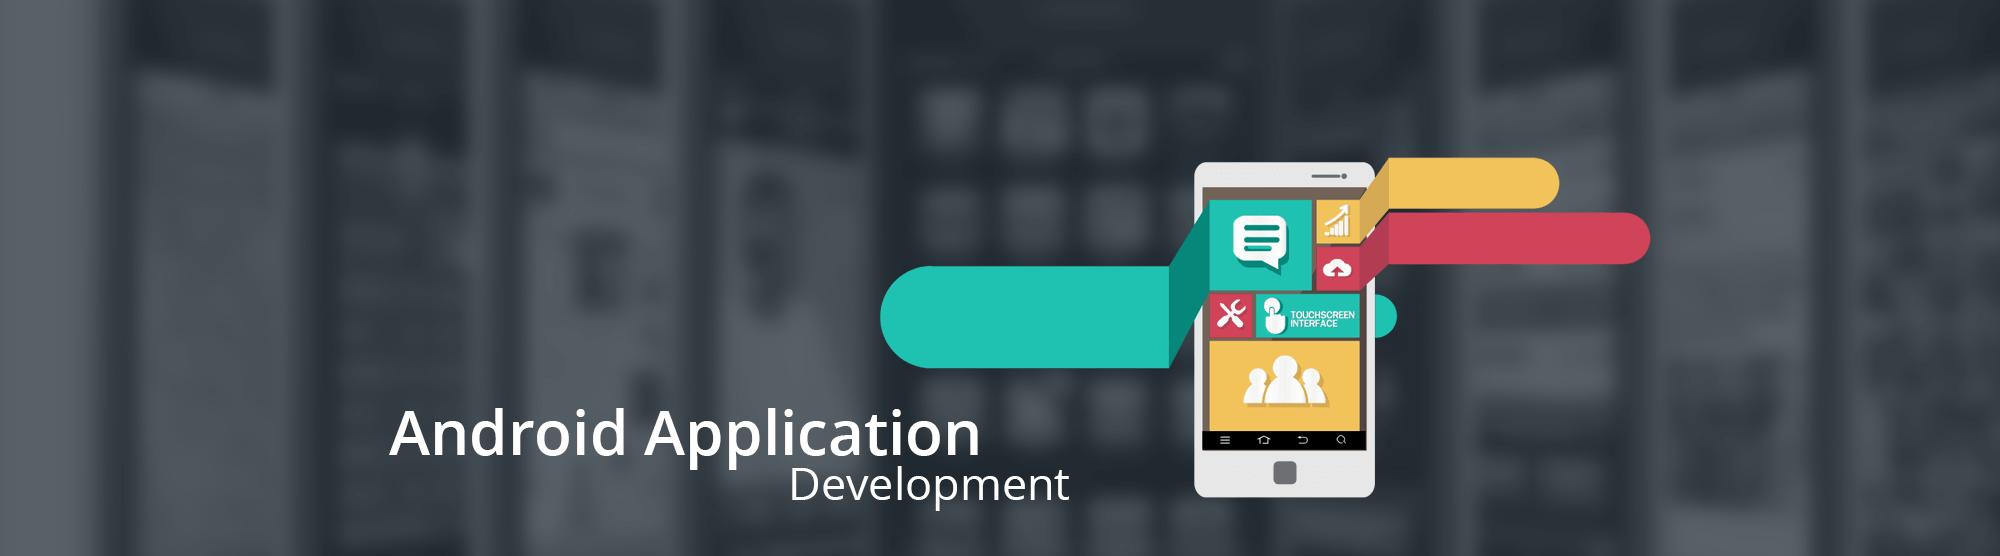 Android Application Development Company Bangalore